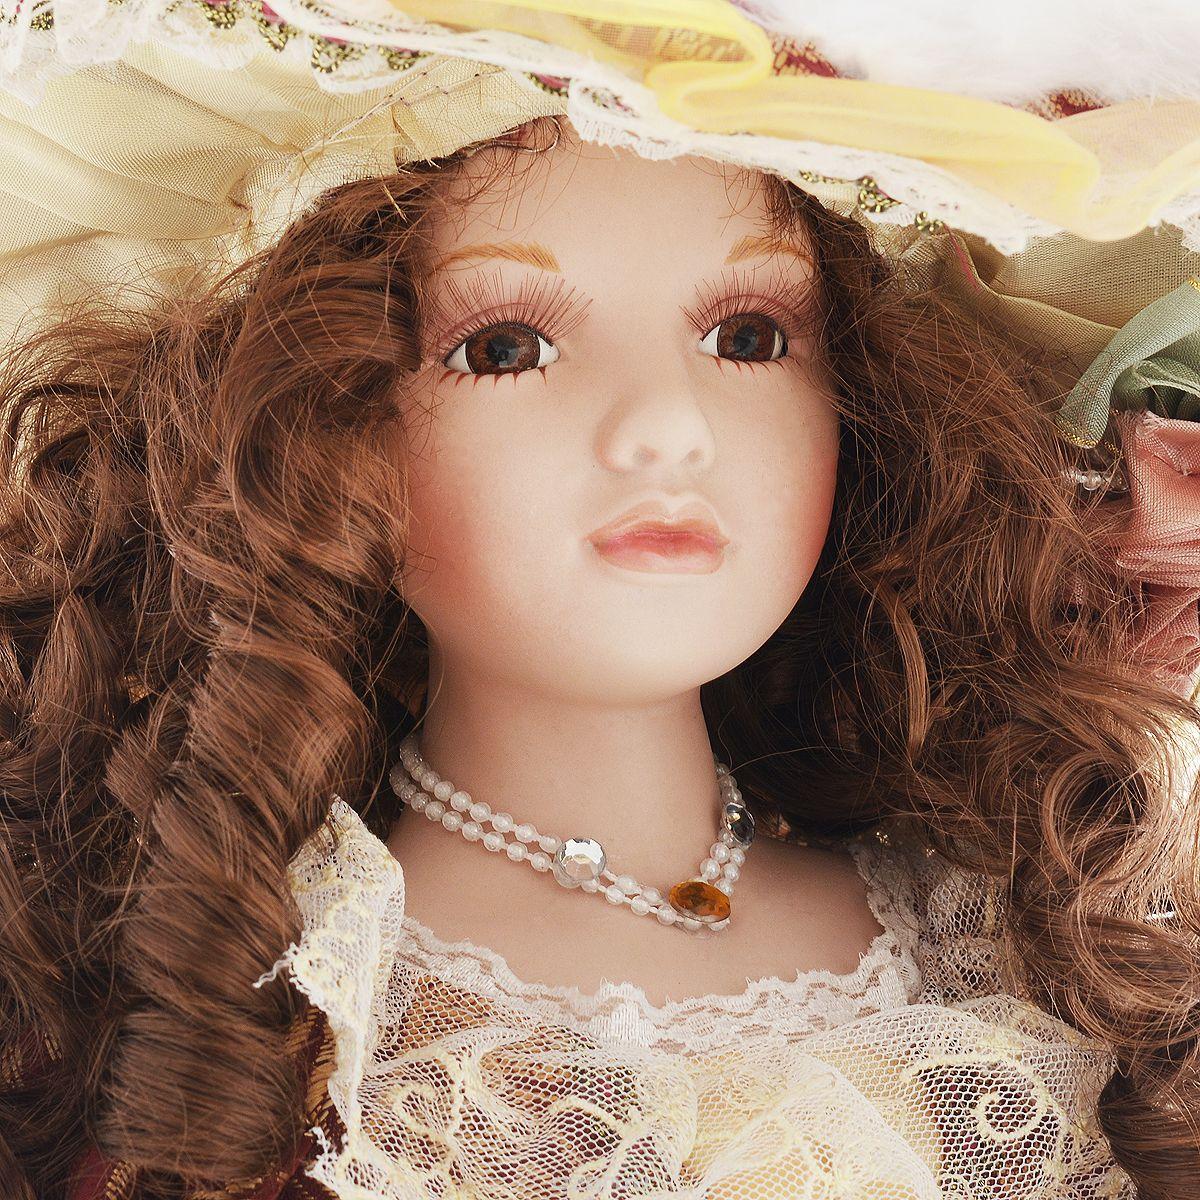 Фарфоровые куклы картинки, для